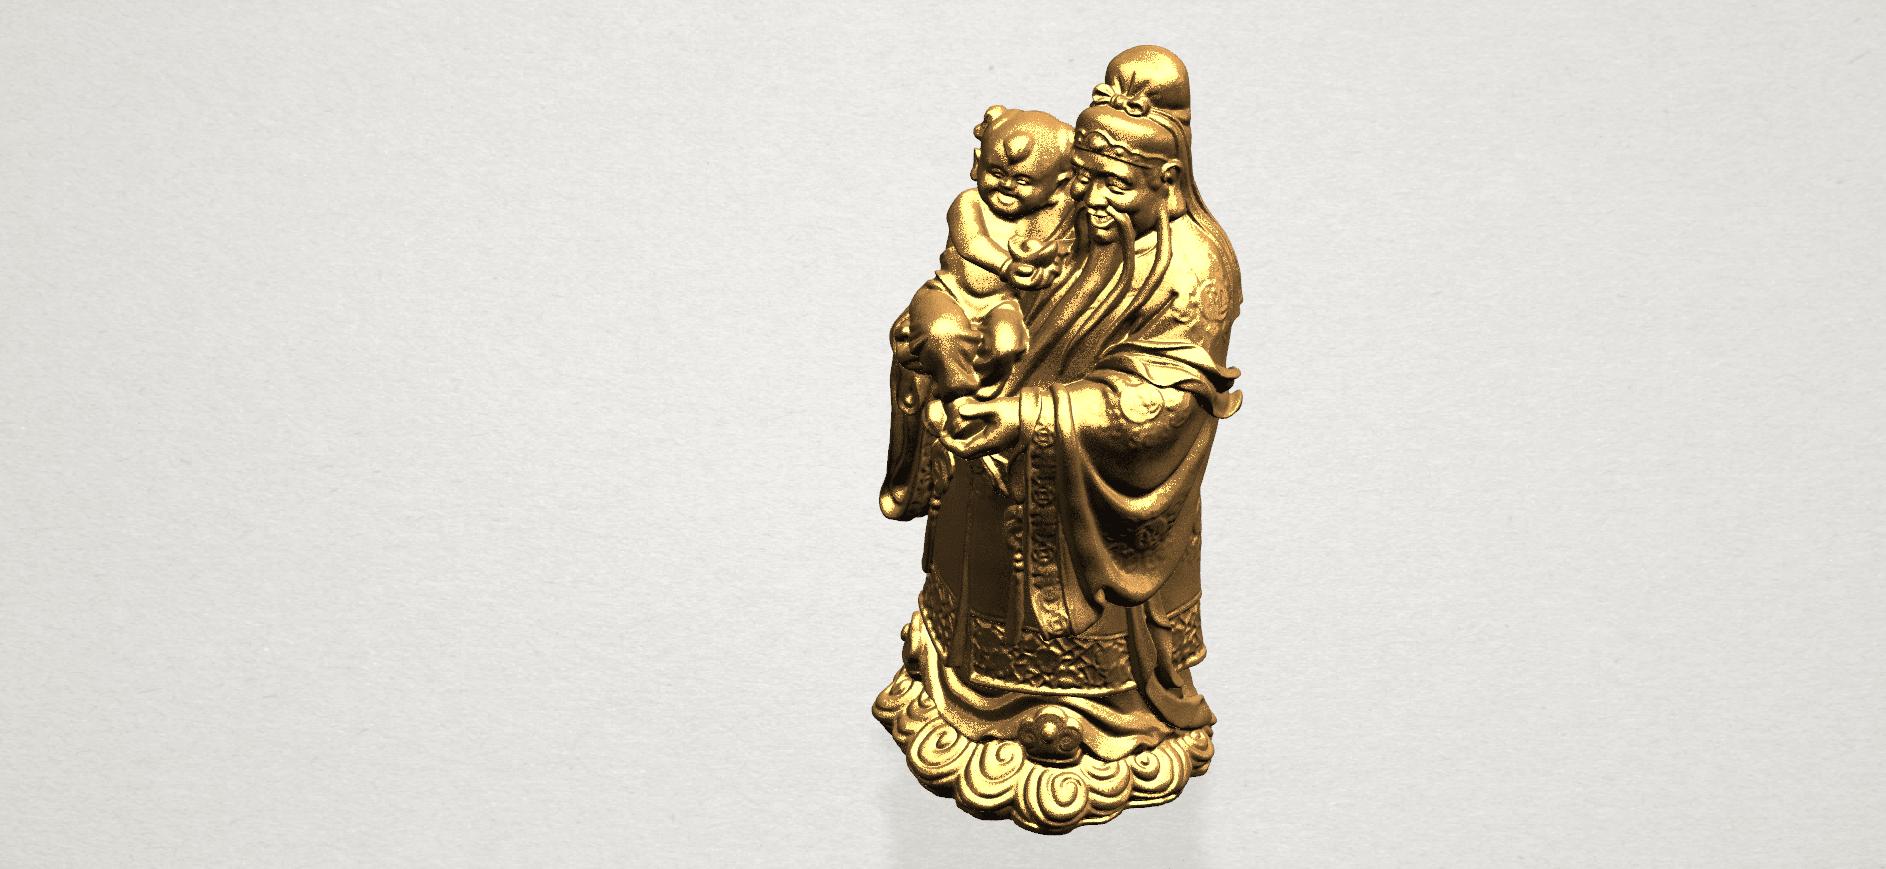 Fook (Fook Look Sao) 80mm - B07.png Download free STL file Fook (Fook Look Sao) • 3D printer template, GeorgesNikkei